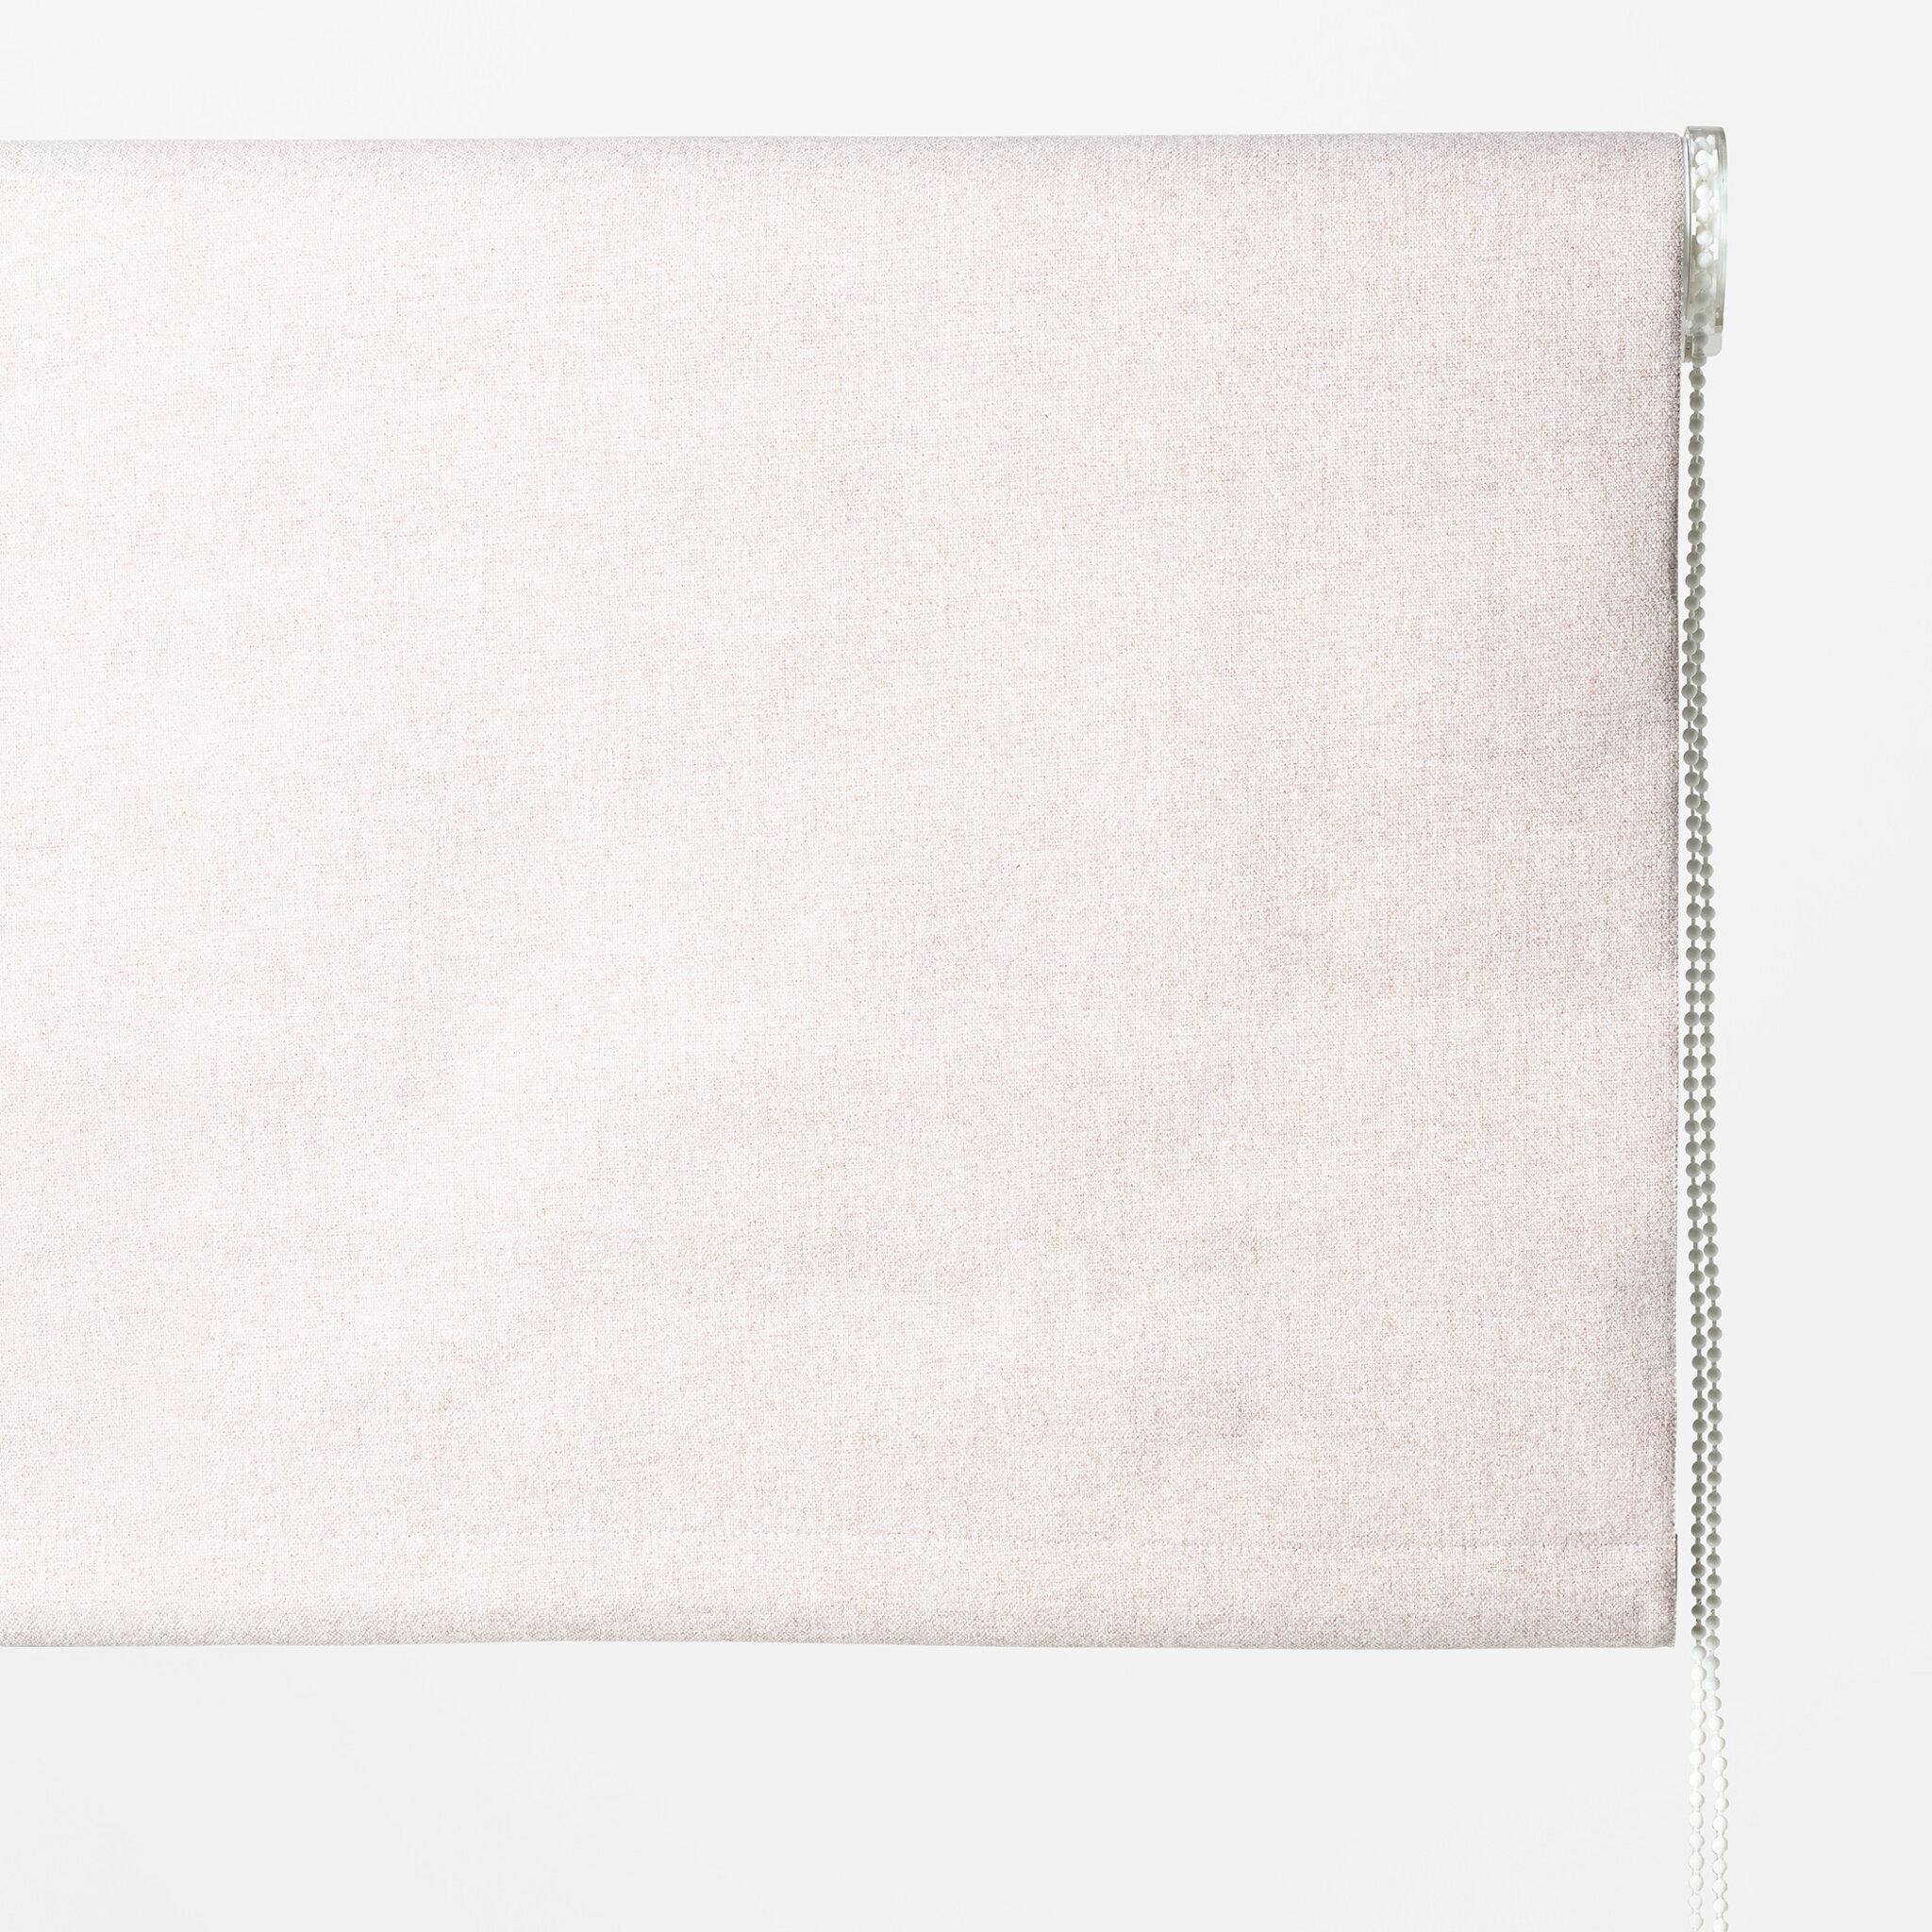 Rullgardin SOVMORGON 140x165 cm